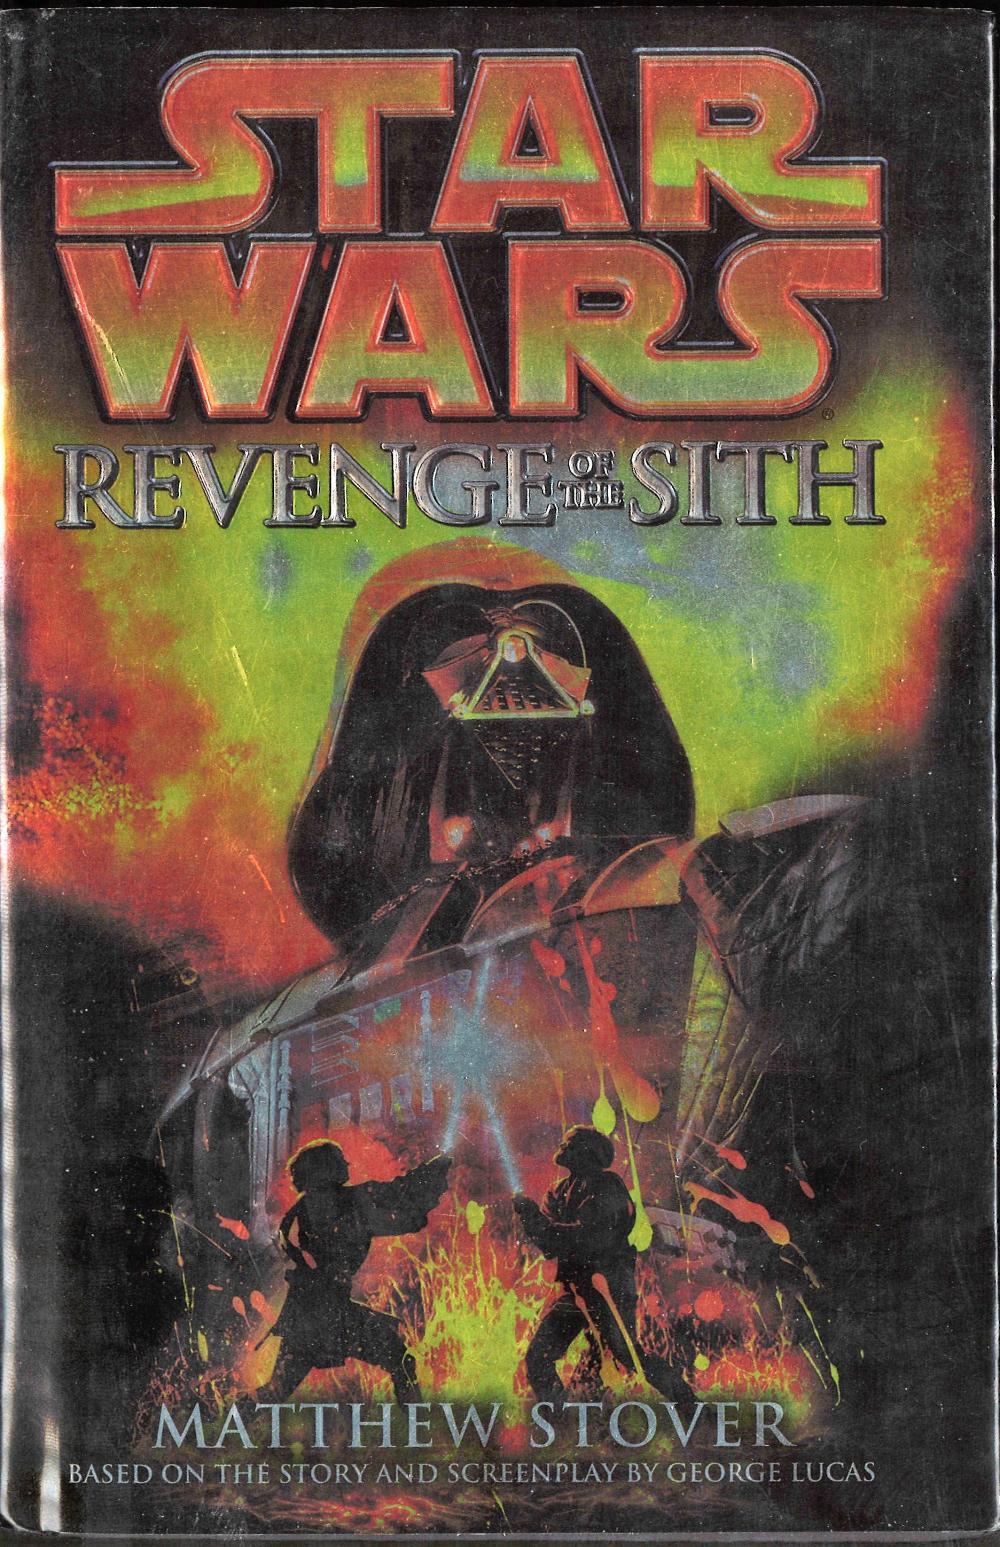 Matthew Stover Signed Star Wars Revenge Of The Sith Hardba